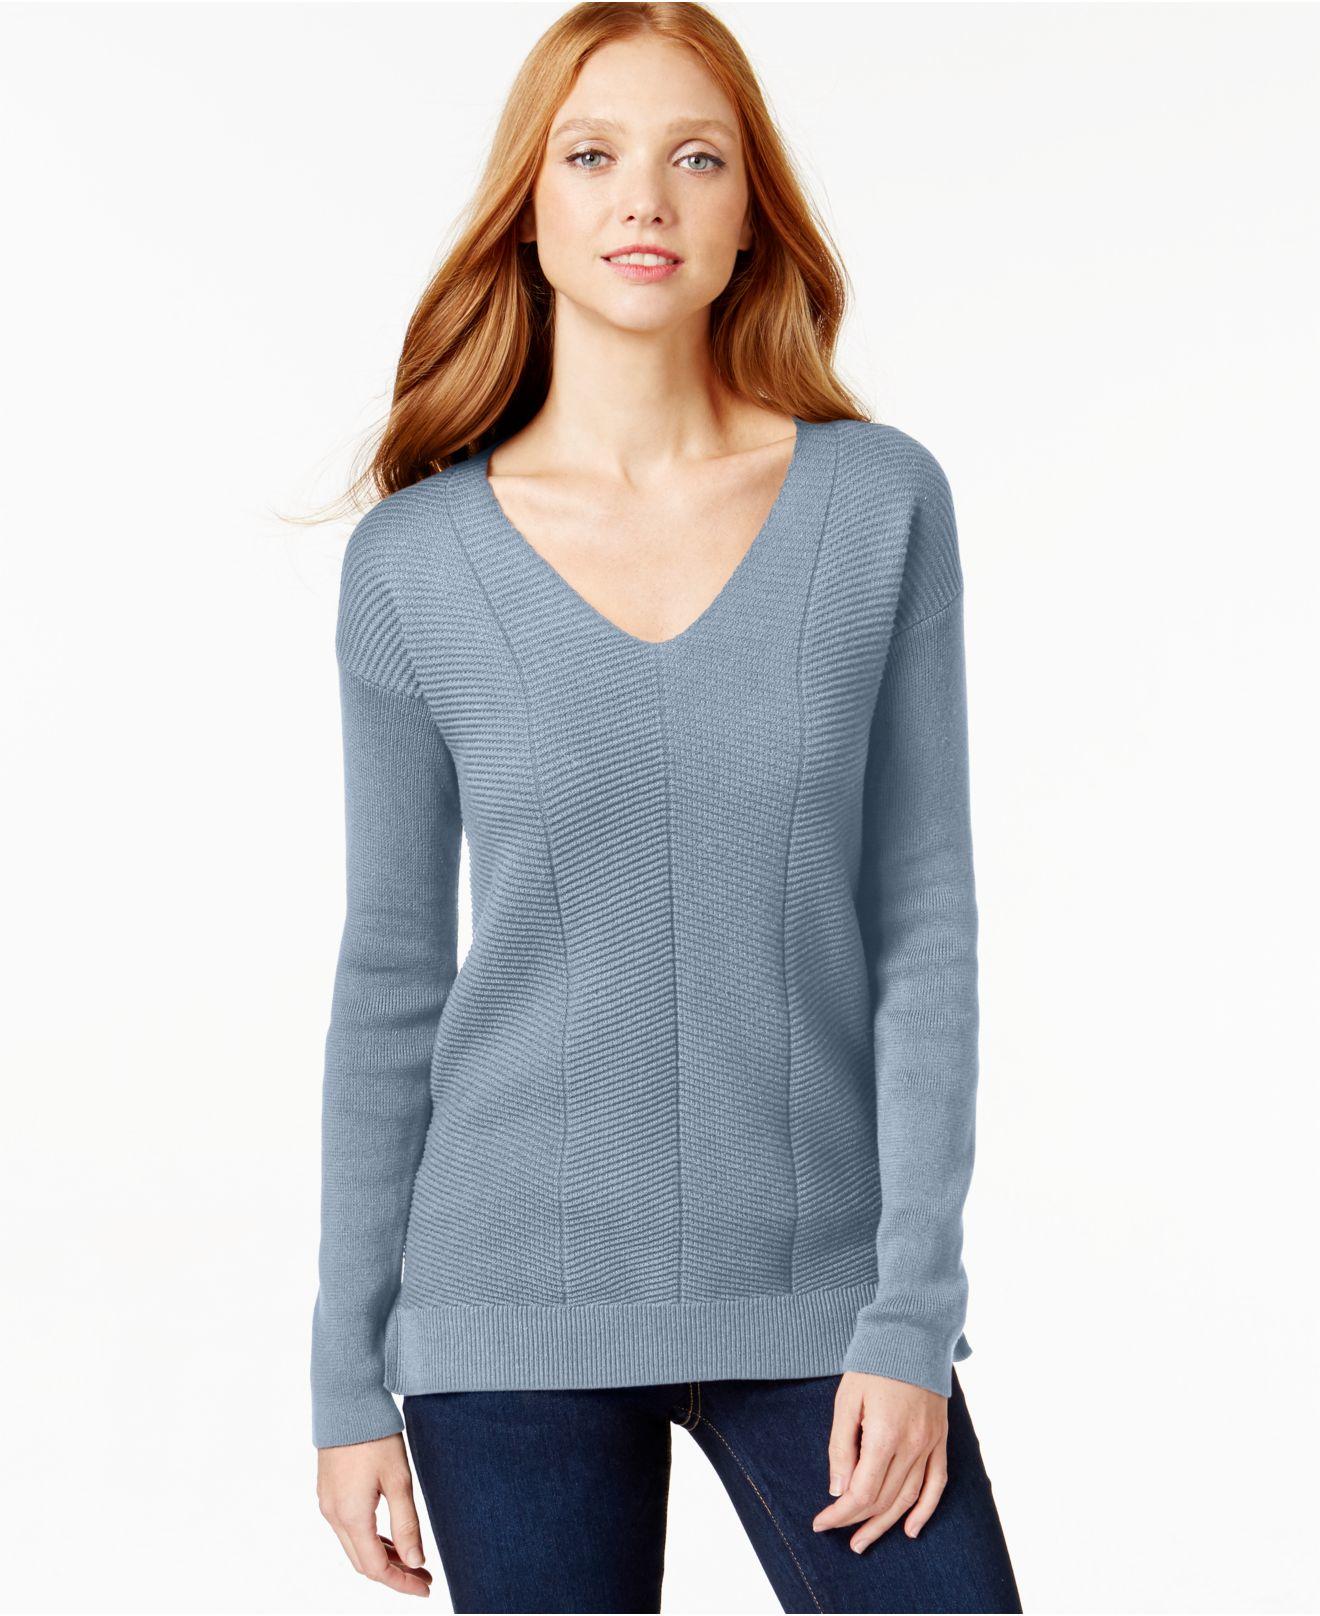 calvin klein jeans v neck knit sweater in blue gloomy. Black Bedroom Furniture Sets. Home Design Ideas